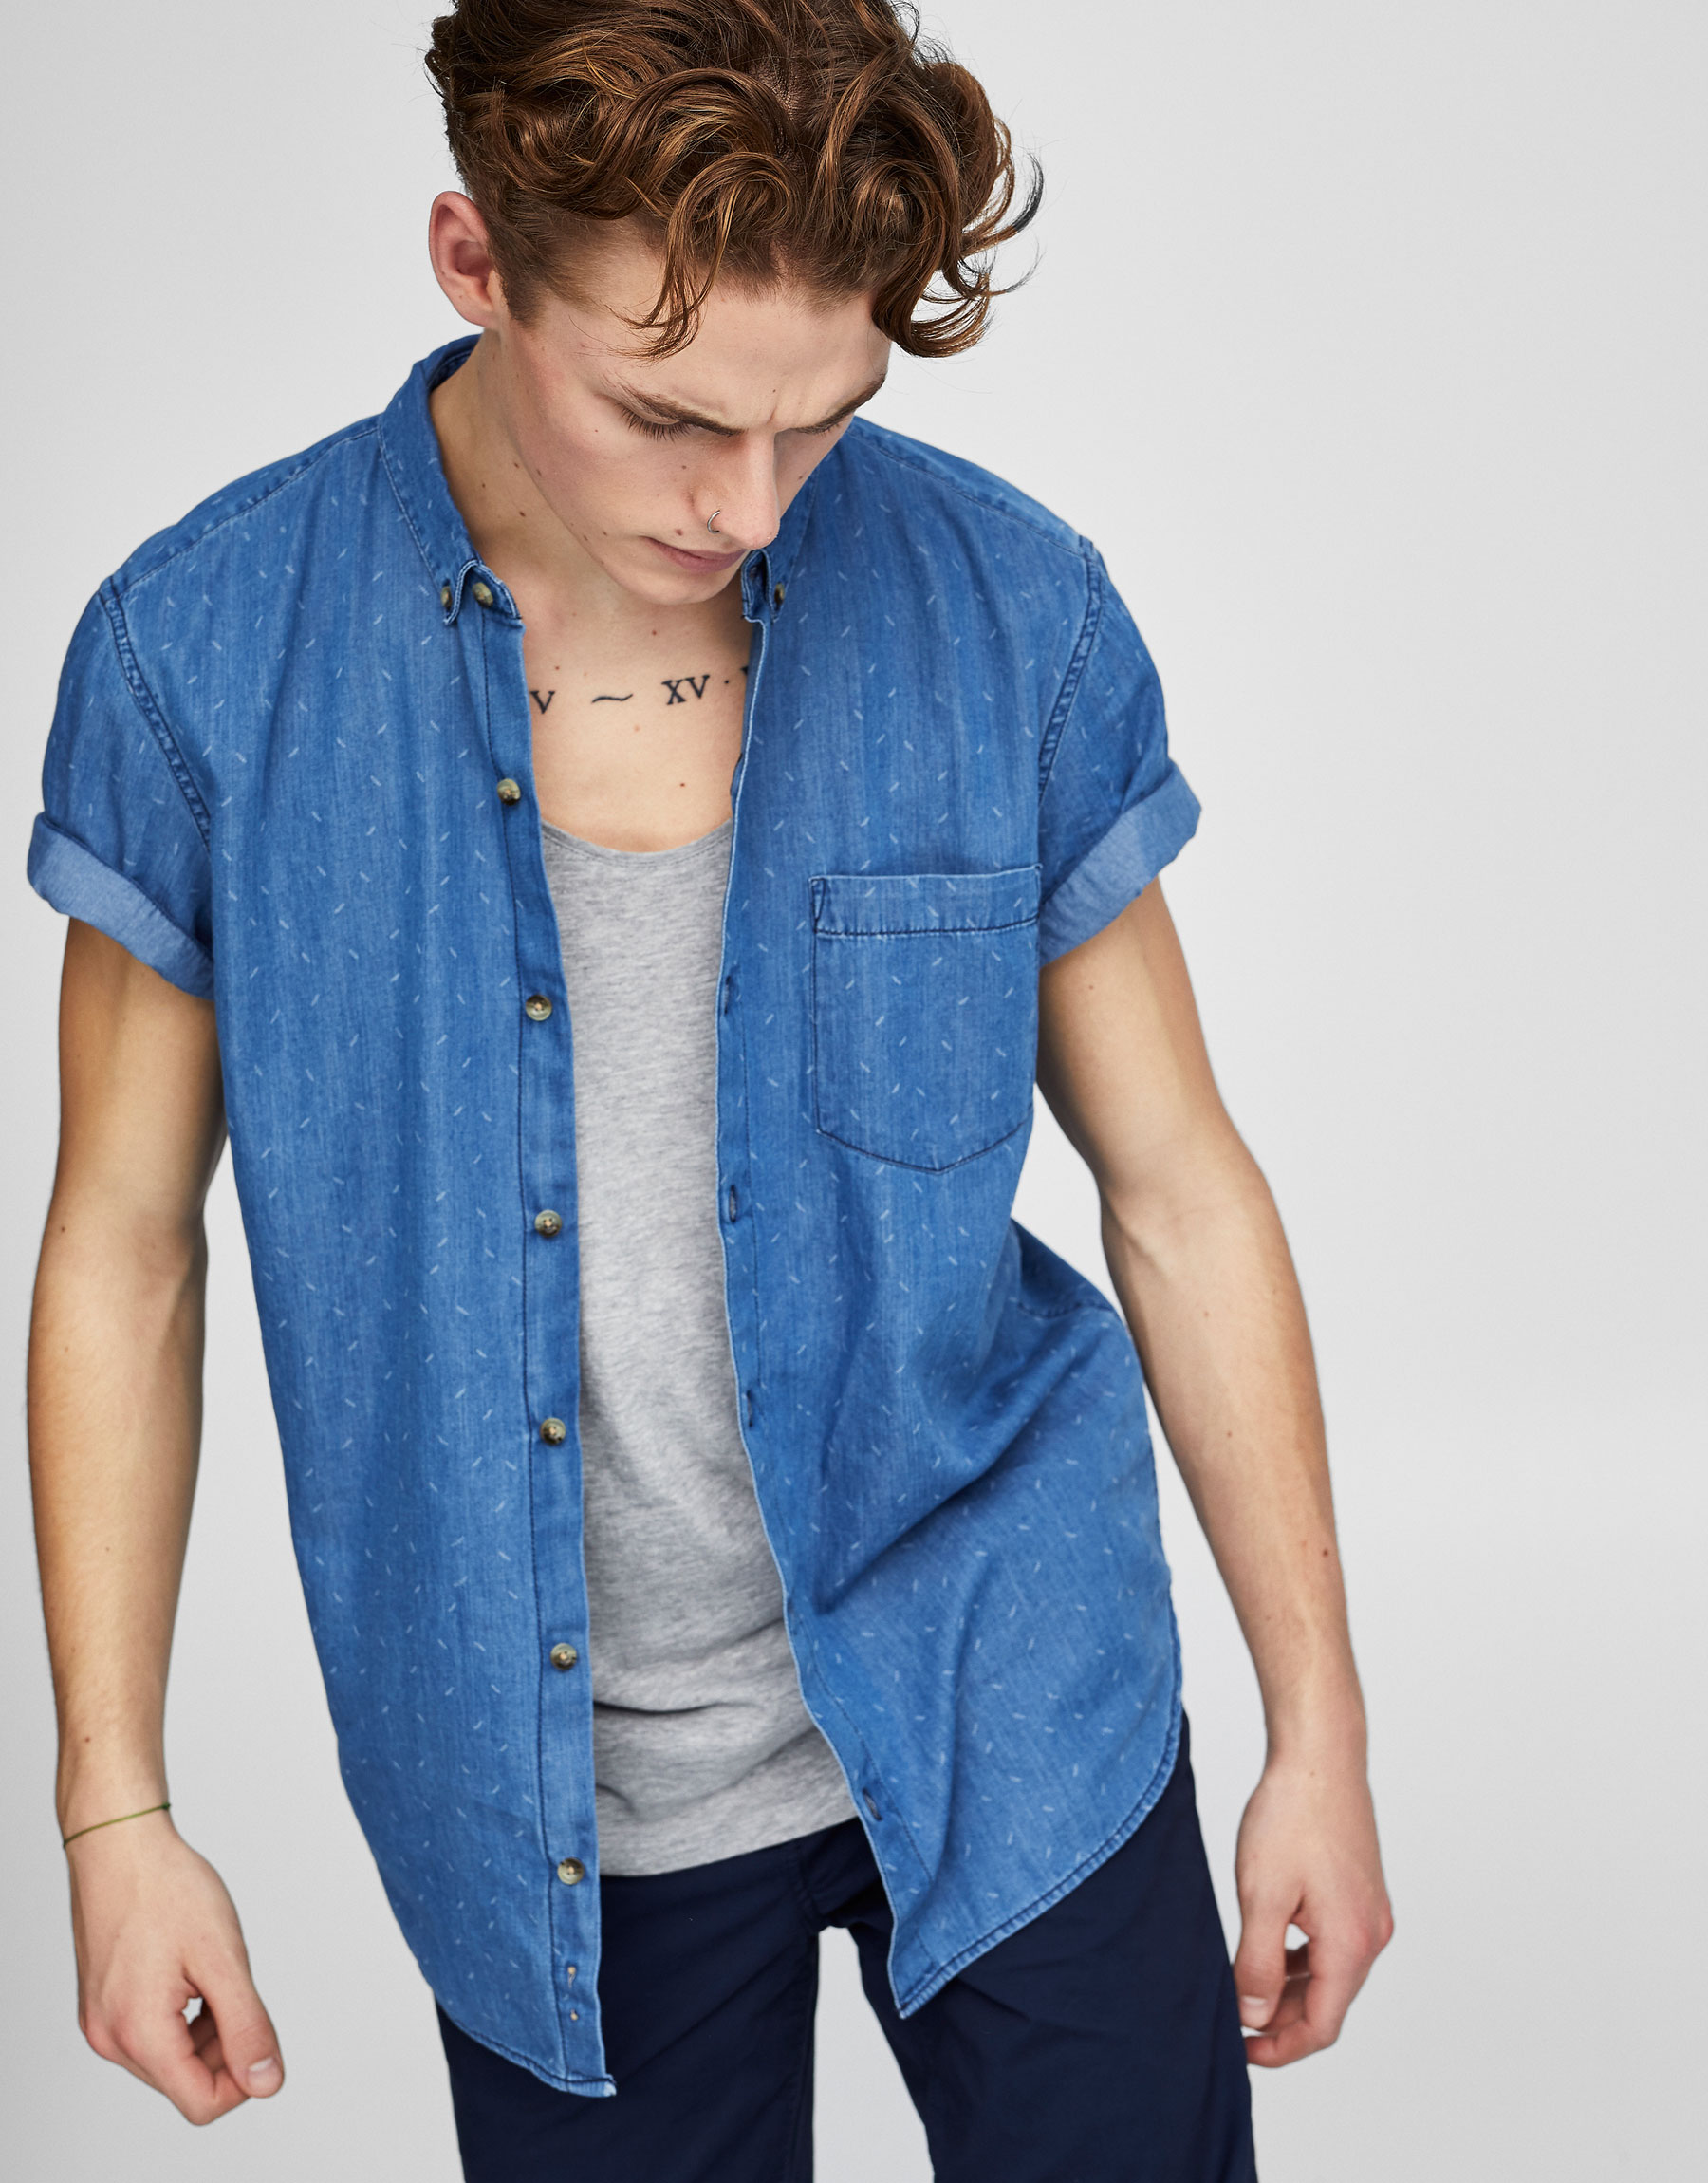 Mini print denim shirt with short sleeves